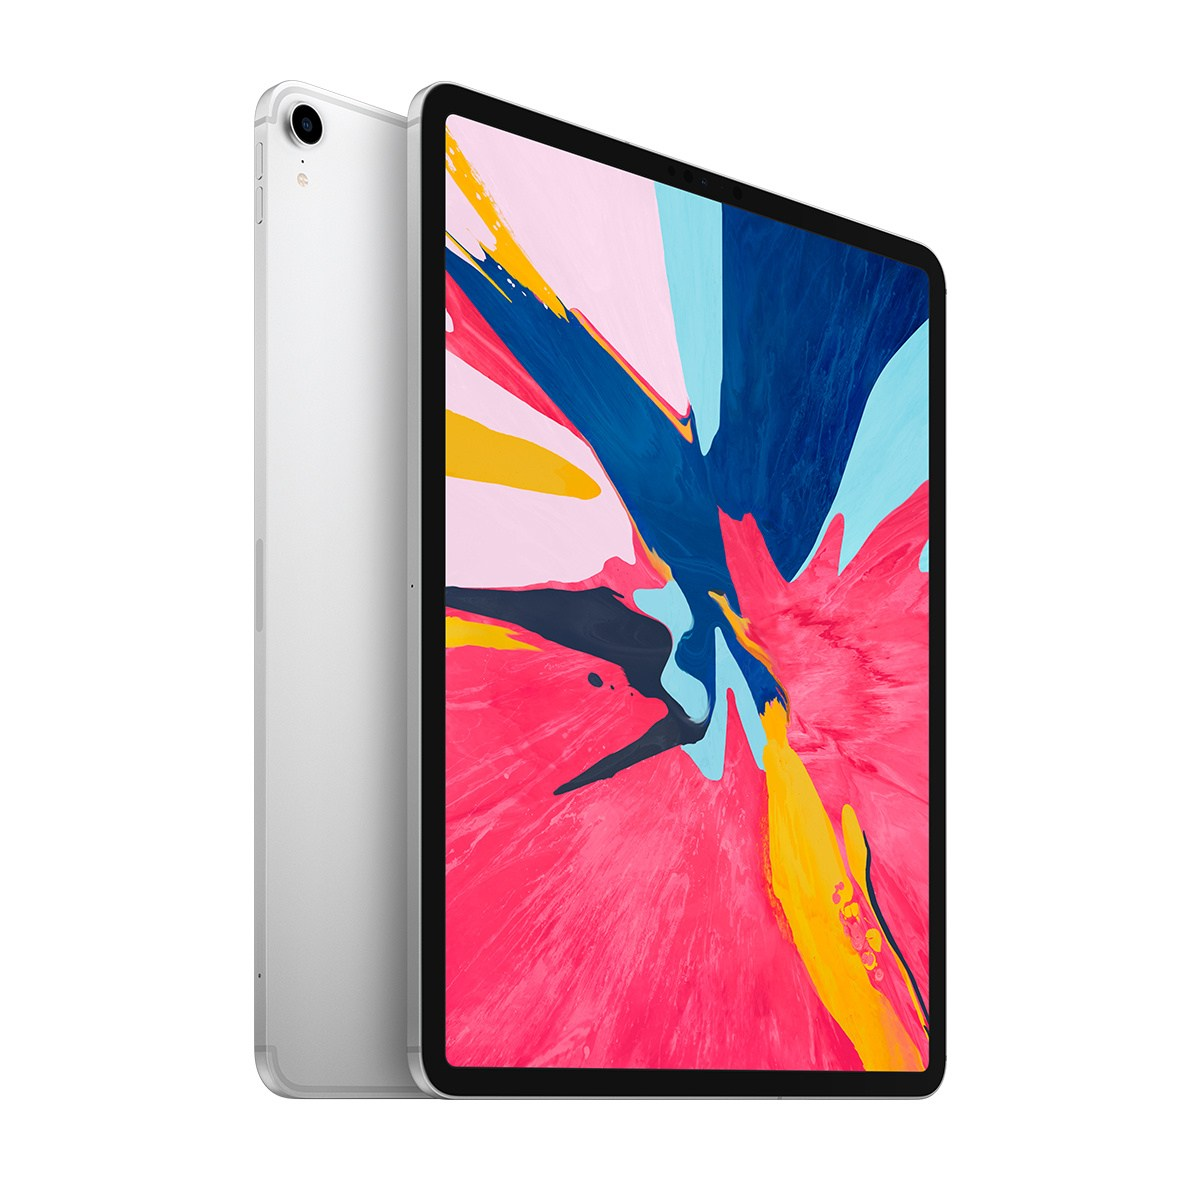 iPad Pro 12.9 512GB 실버 셀룰러MTJJ2KH/A, 단일상품, 단일상품